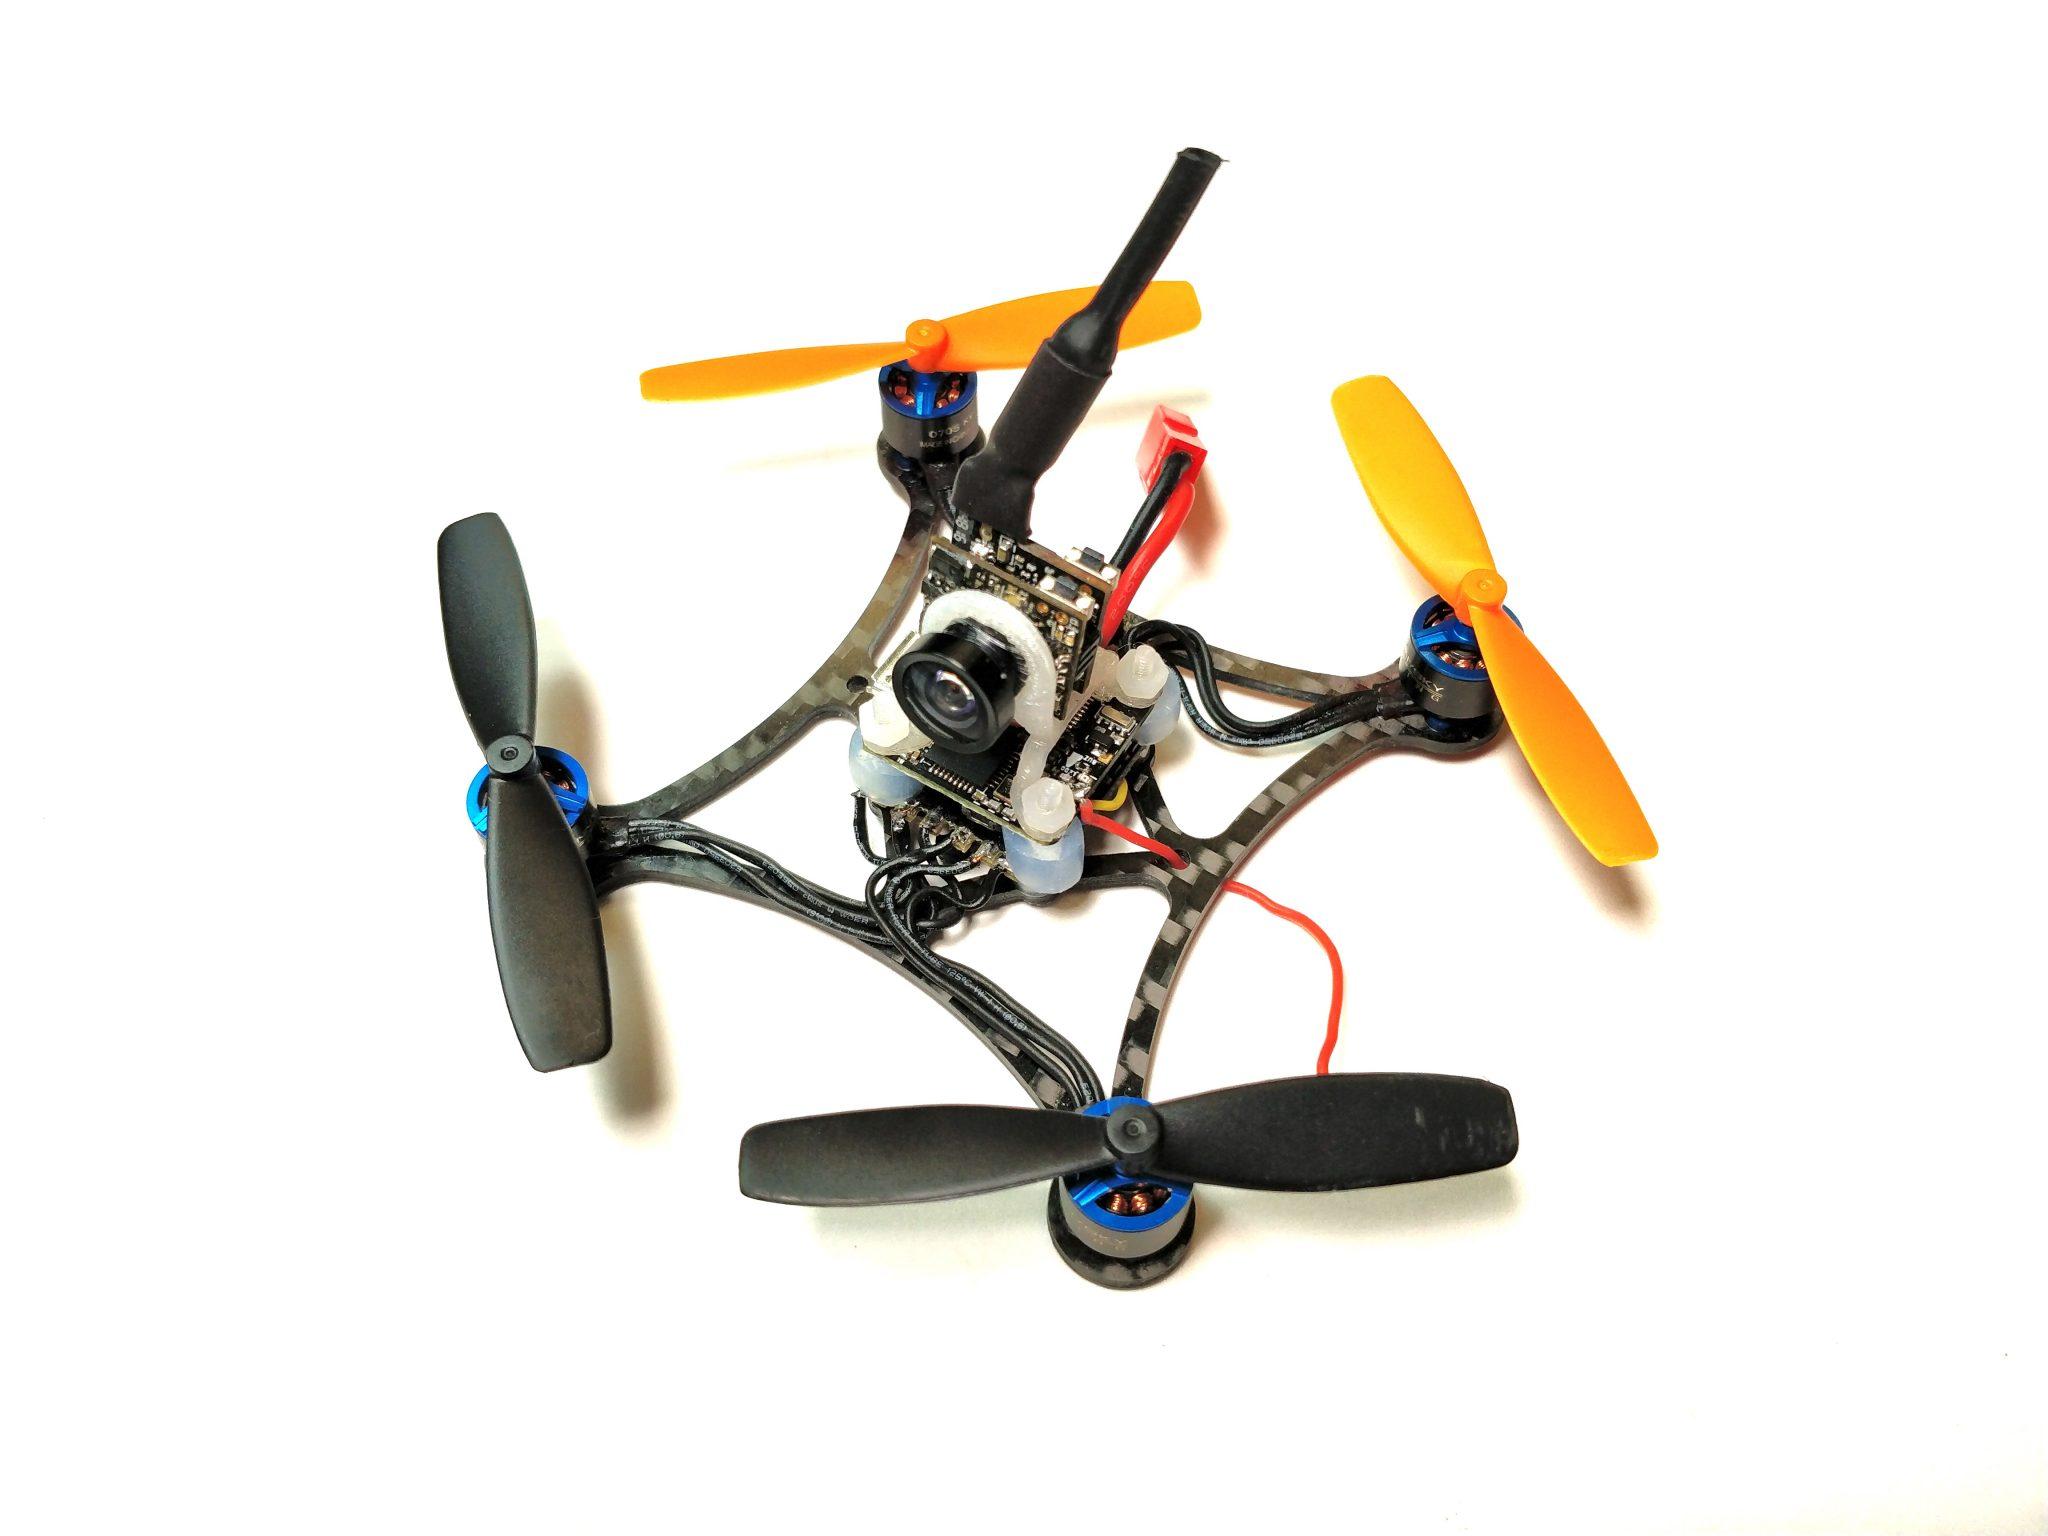 Mira 84mm - 1s Edition - DIY Kit - Micro FPV Racing Drone